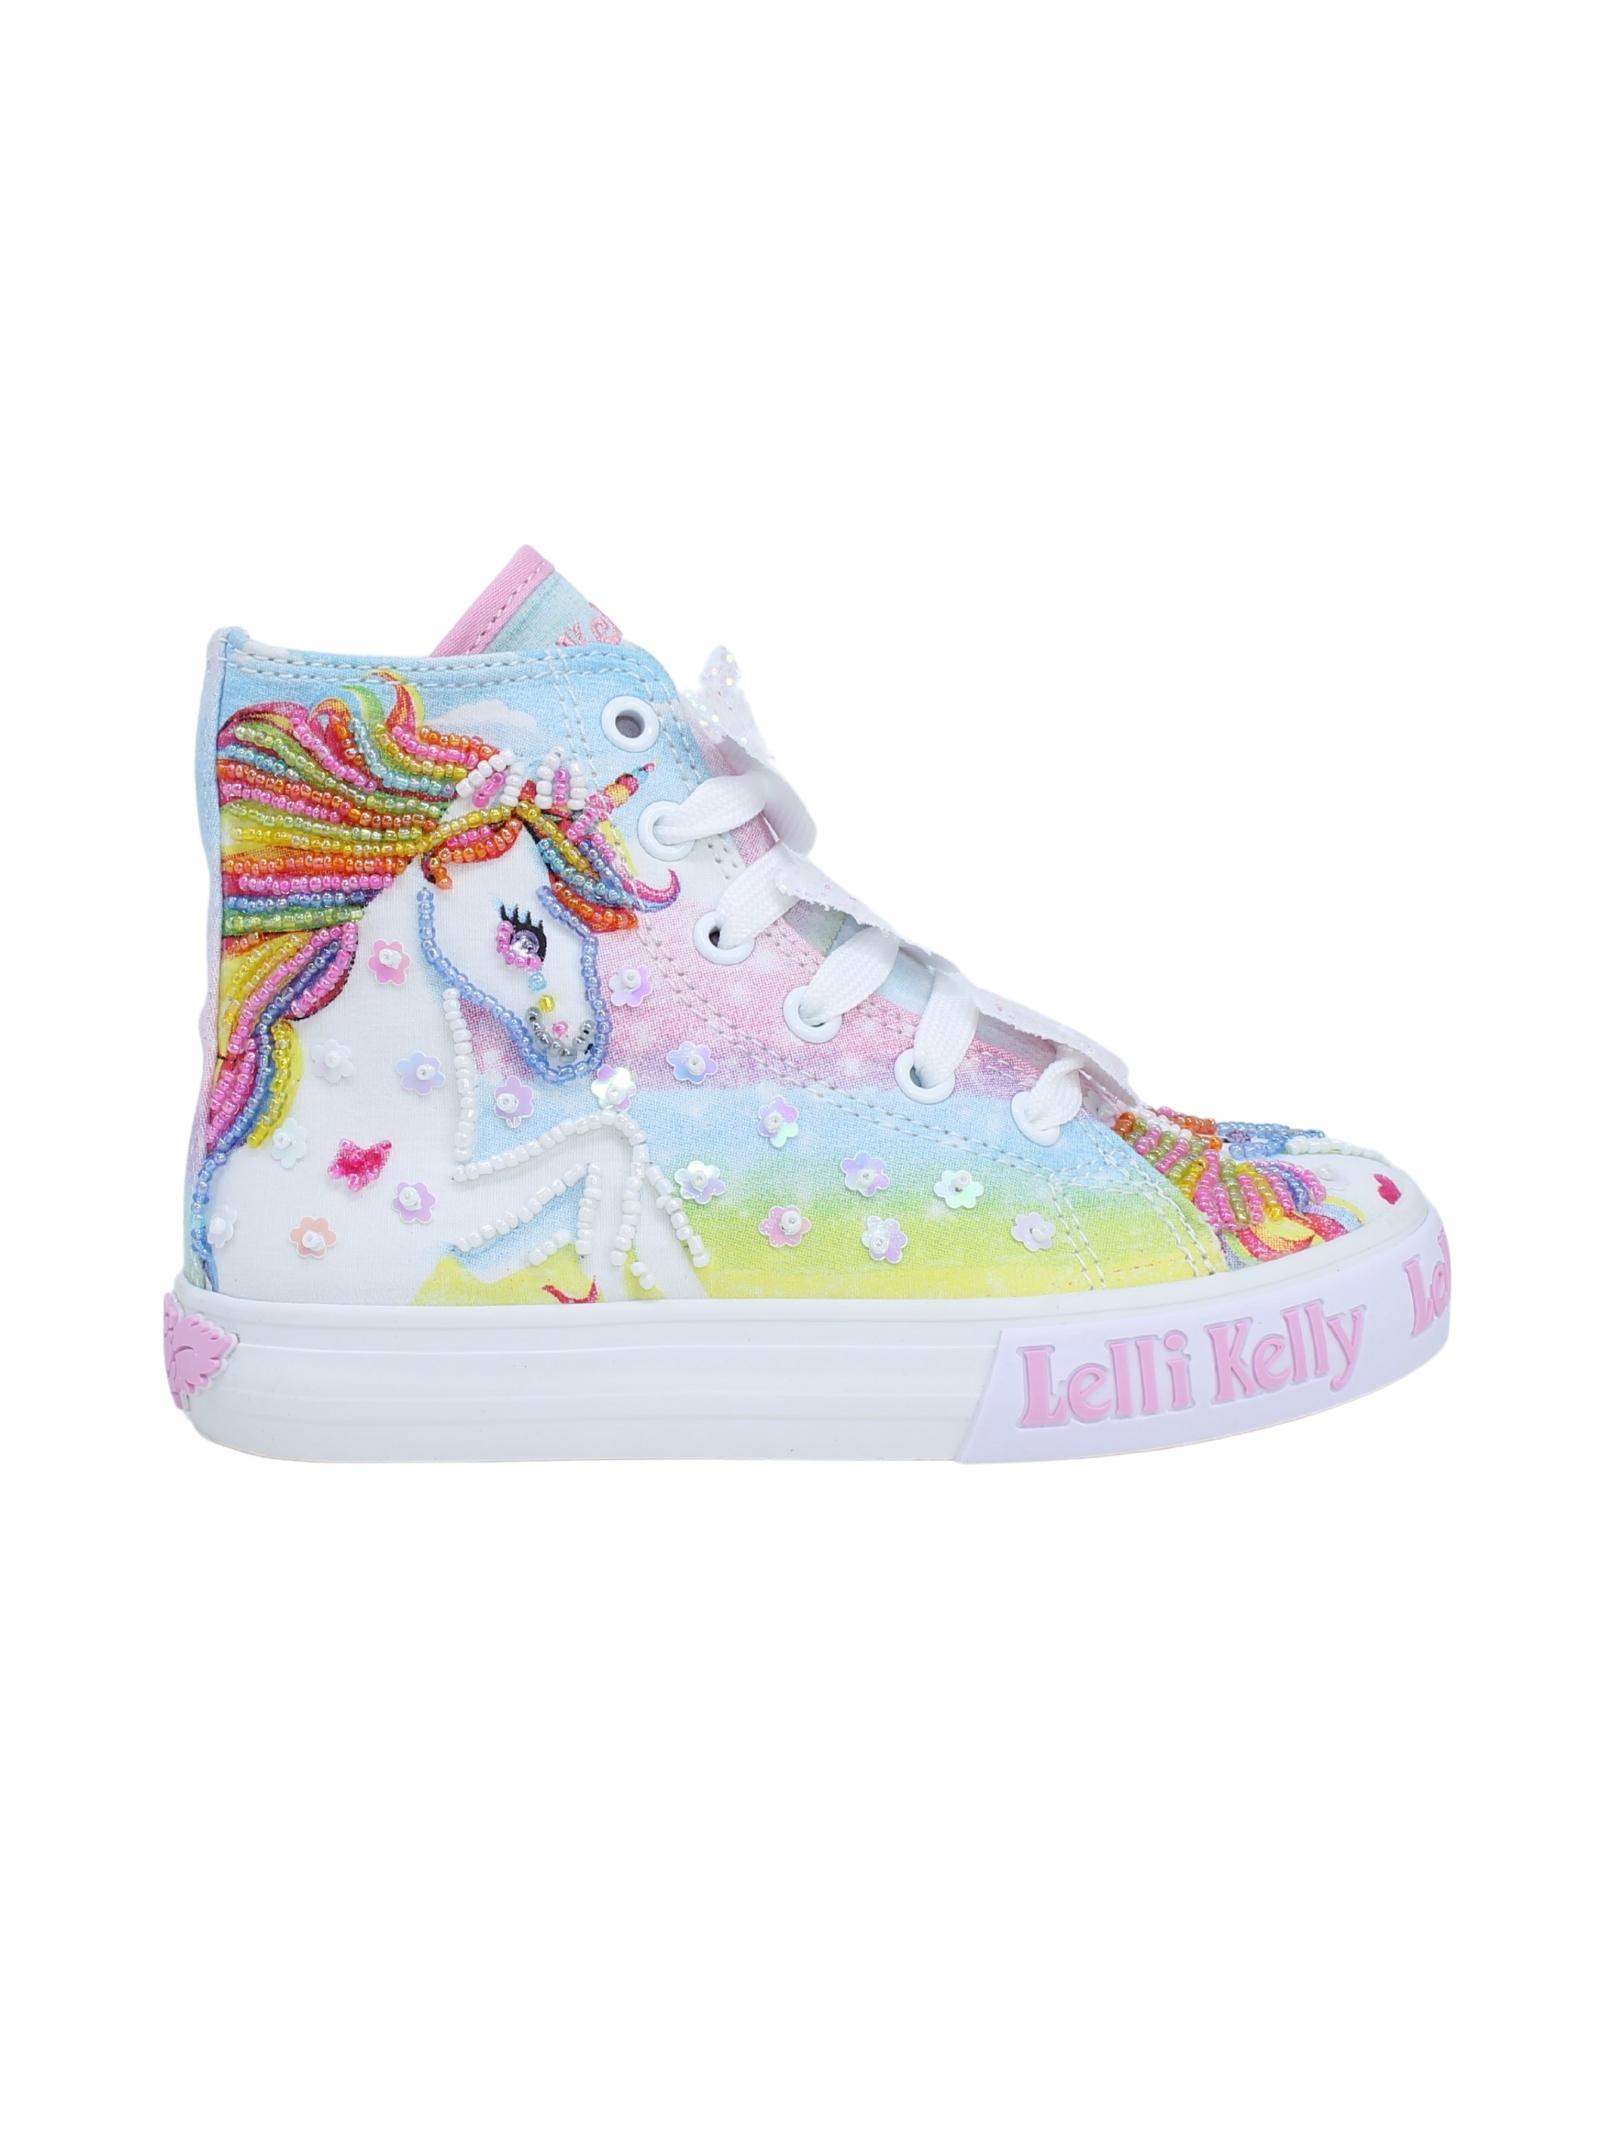 Converse Unicorno White LELLI KELLY | Sneakers | LK9099BIANCO